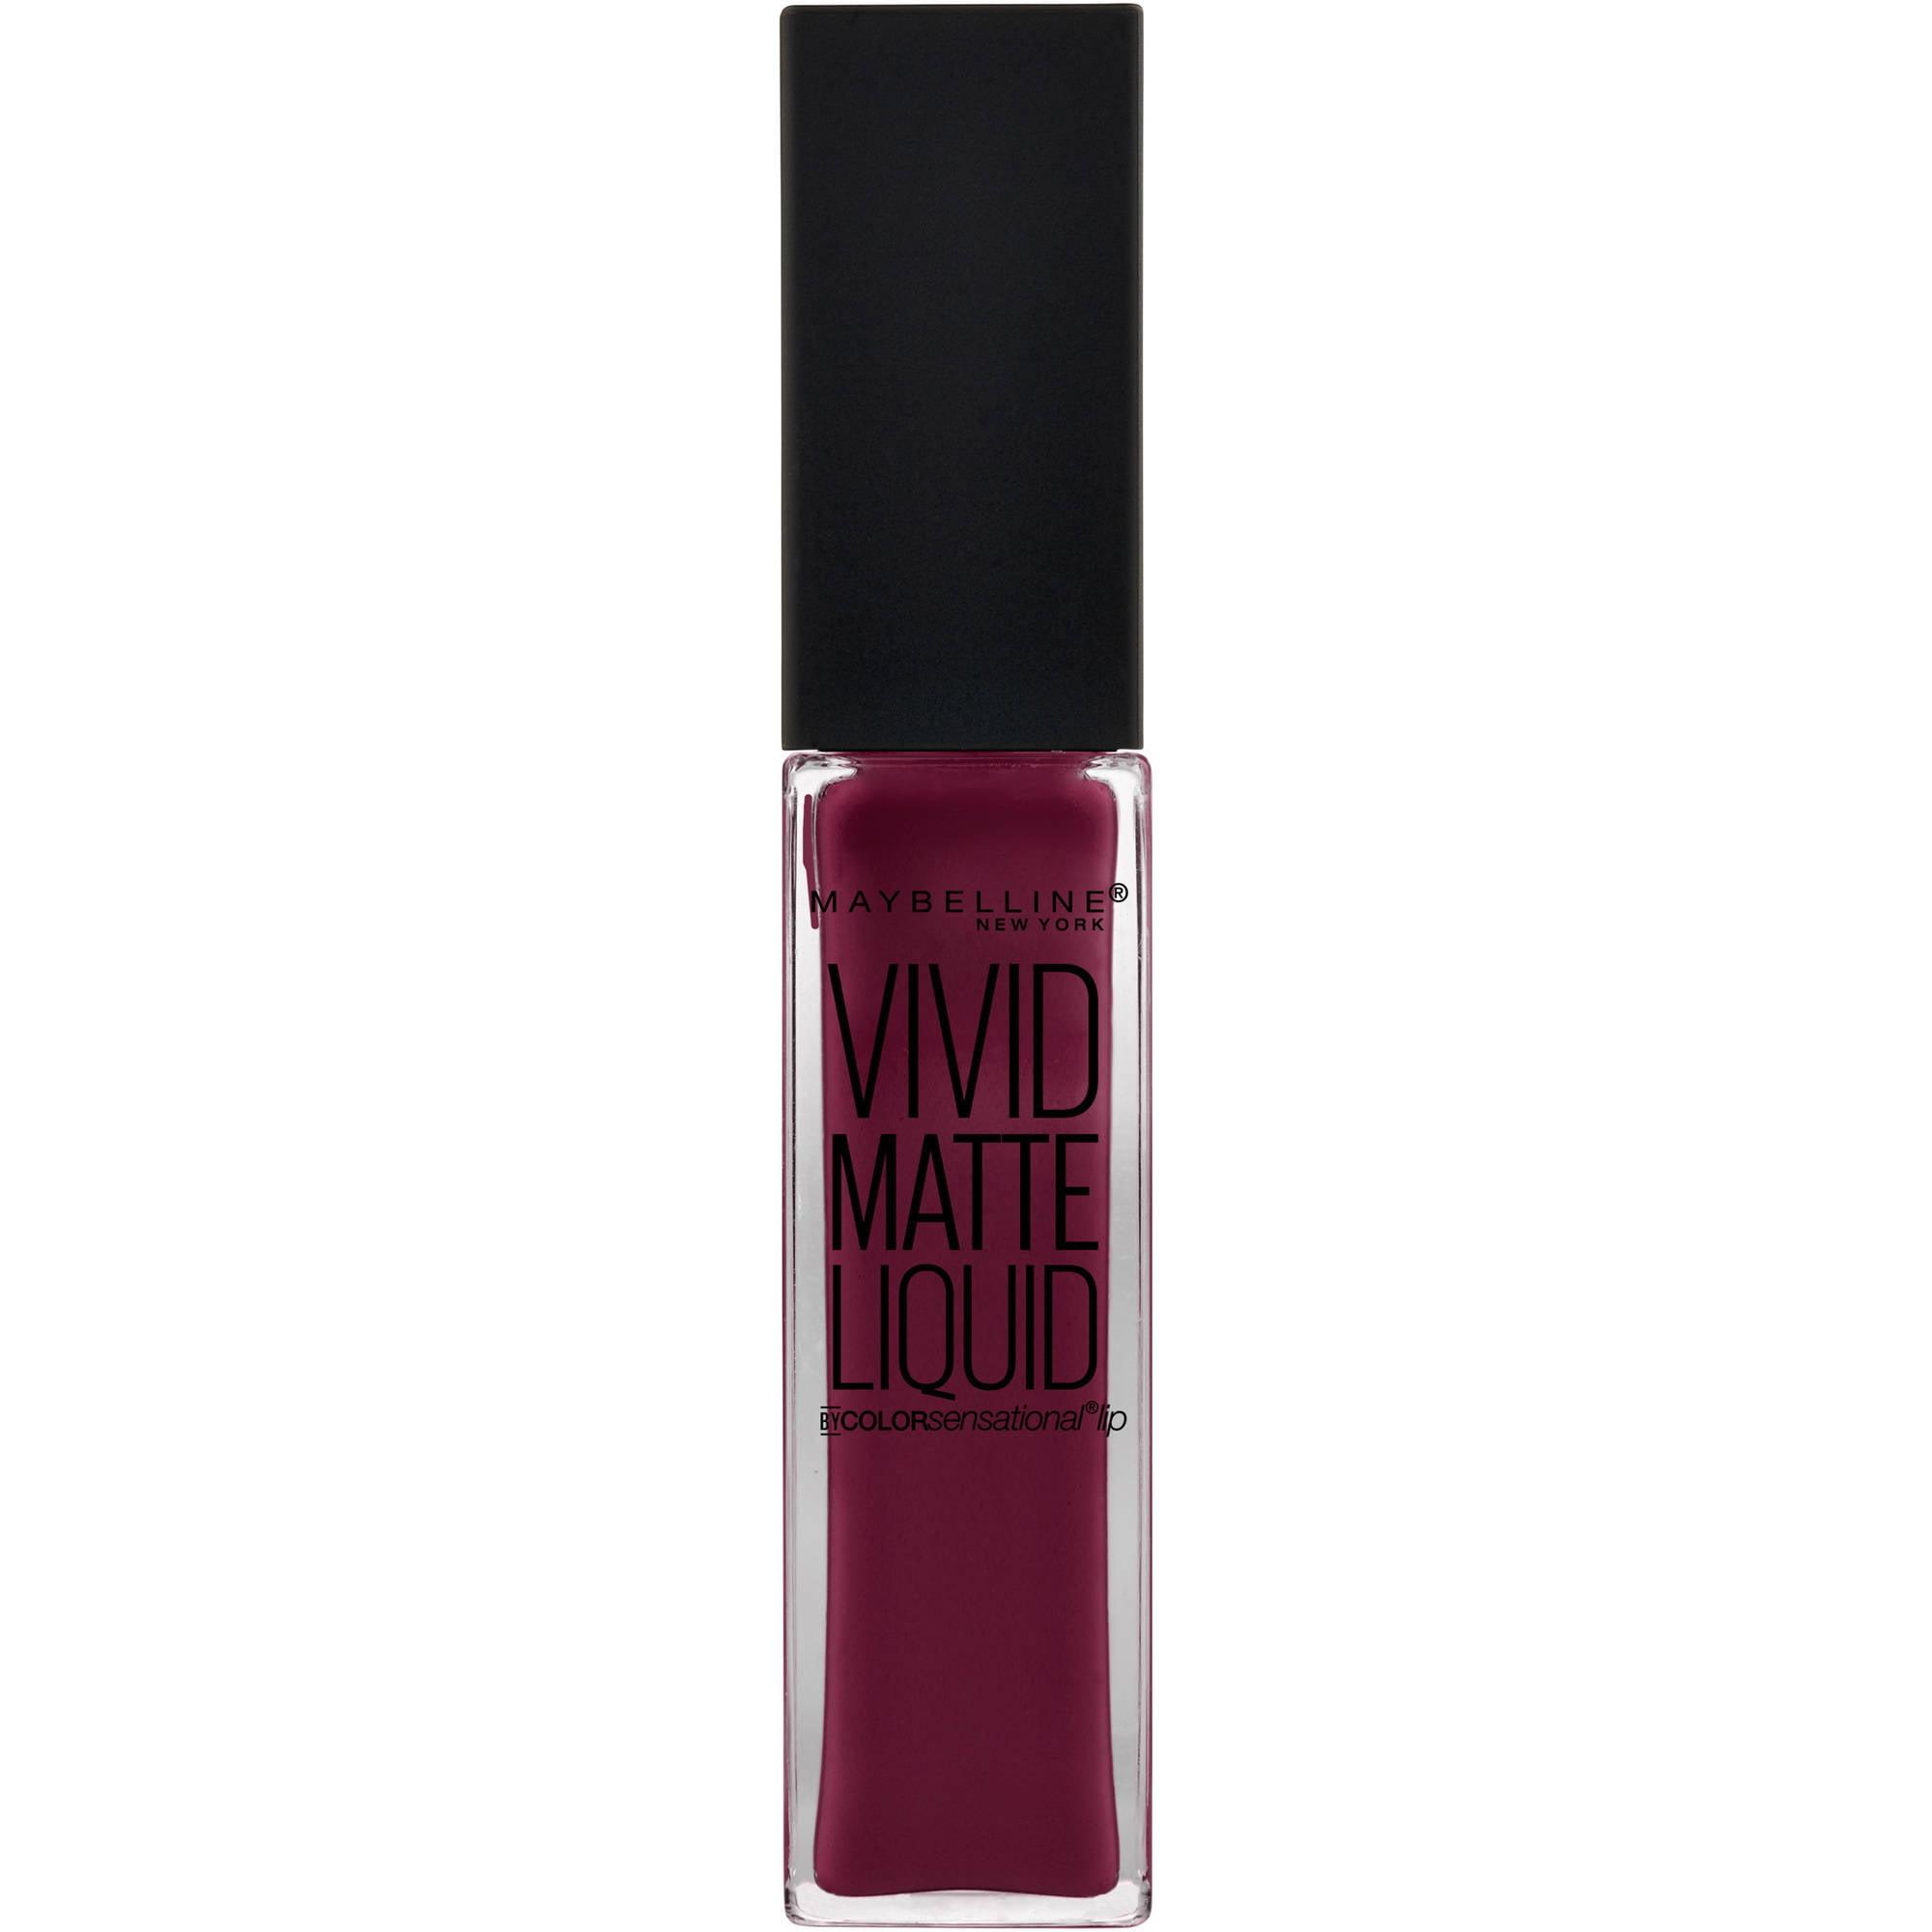 Maybelline - Maybelline Color Sensational Vivid Matte Liquid Lipstick - Walmartcom-7879